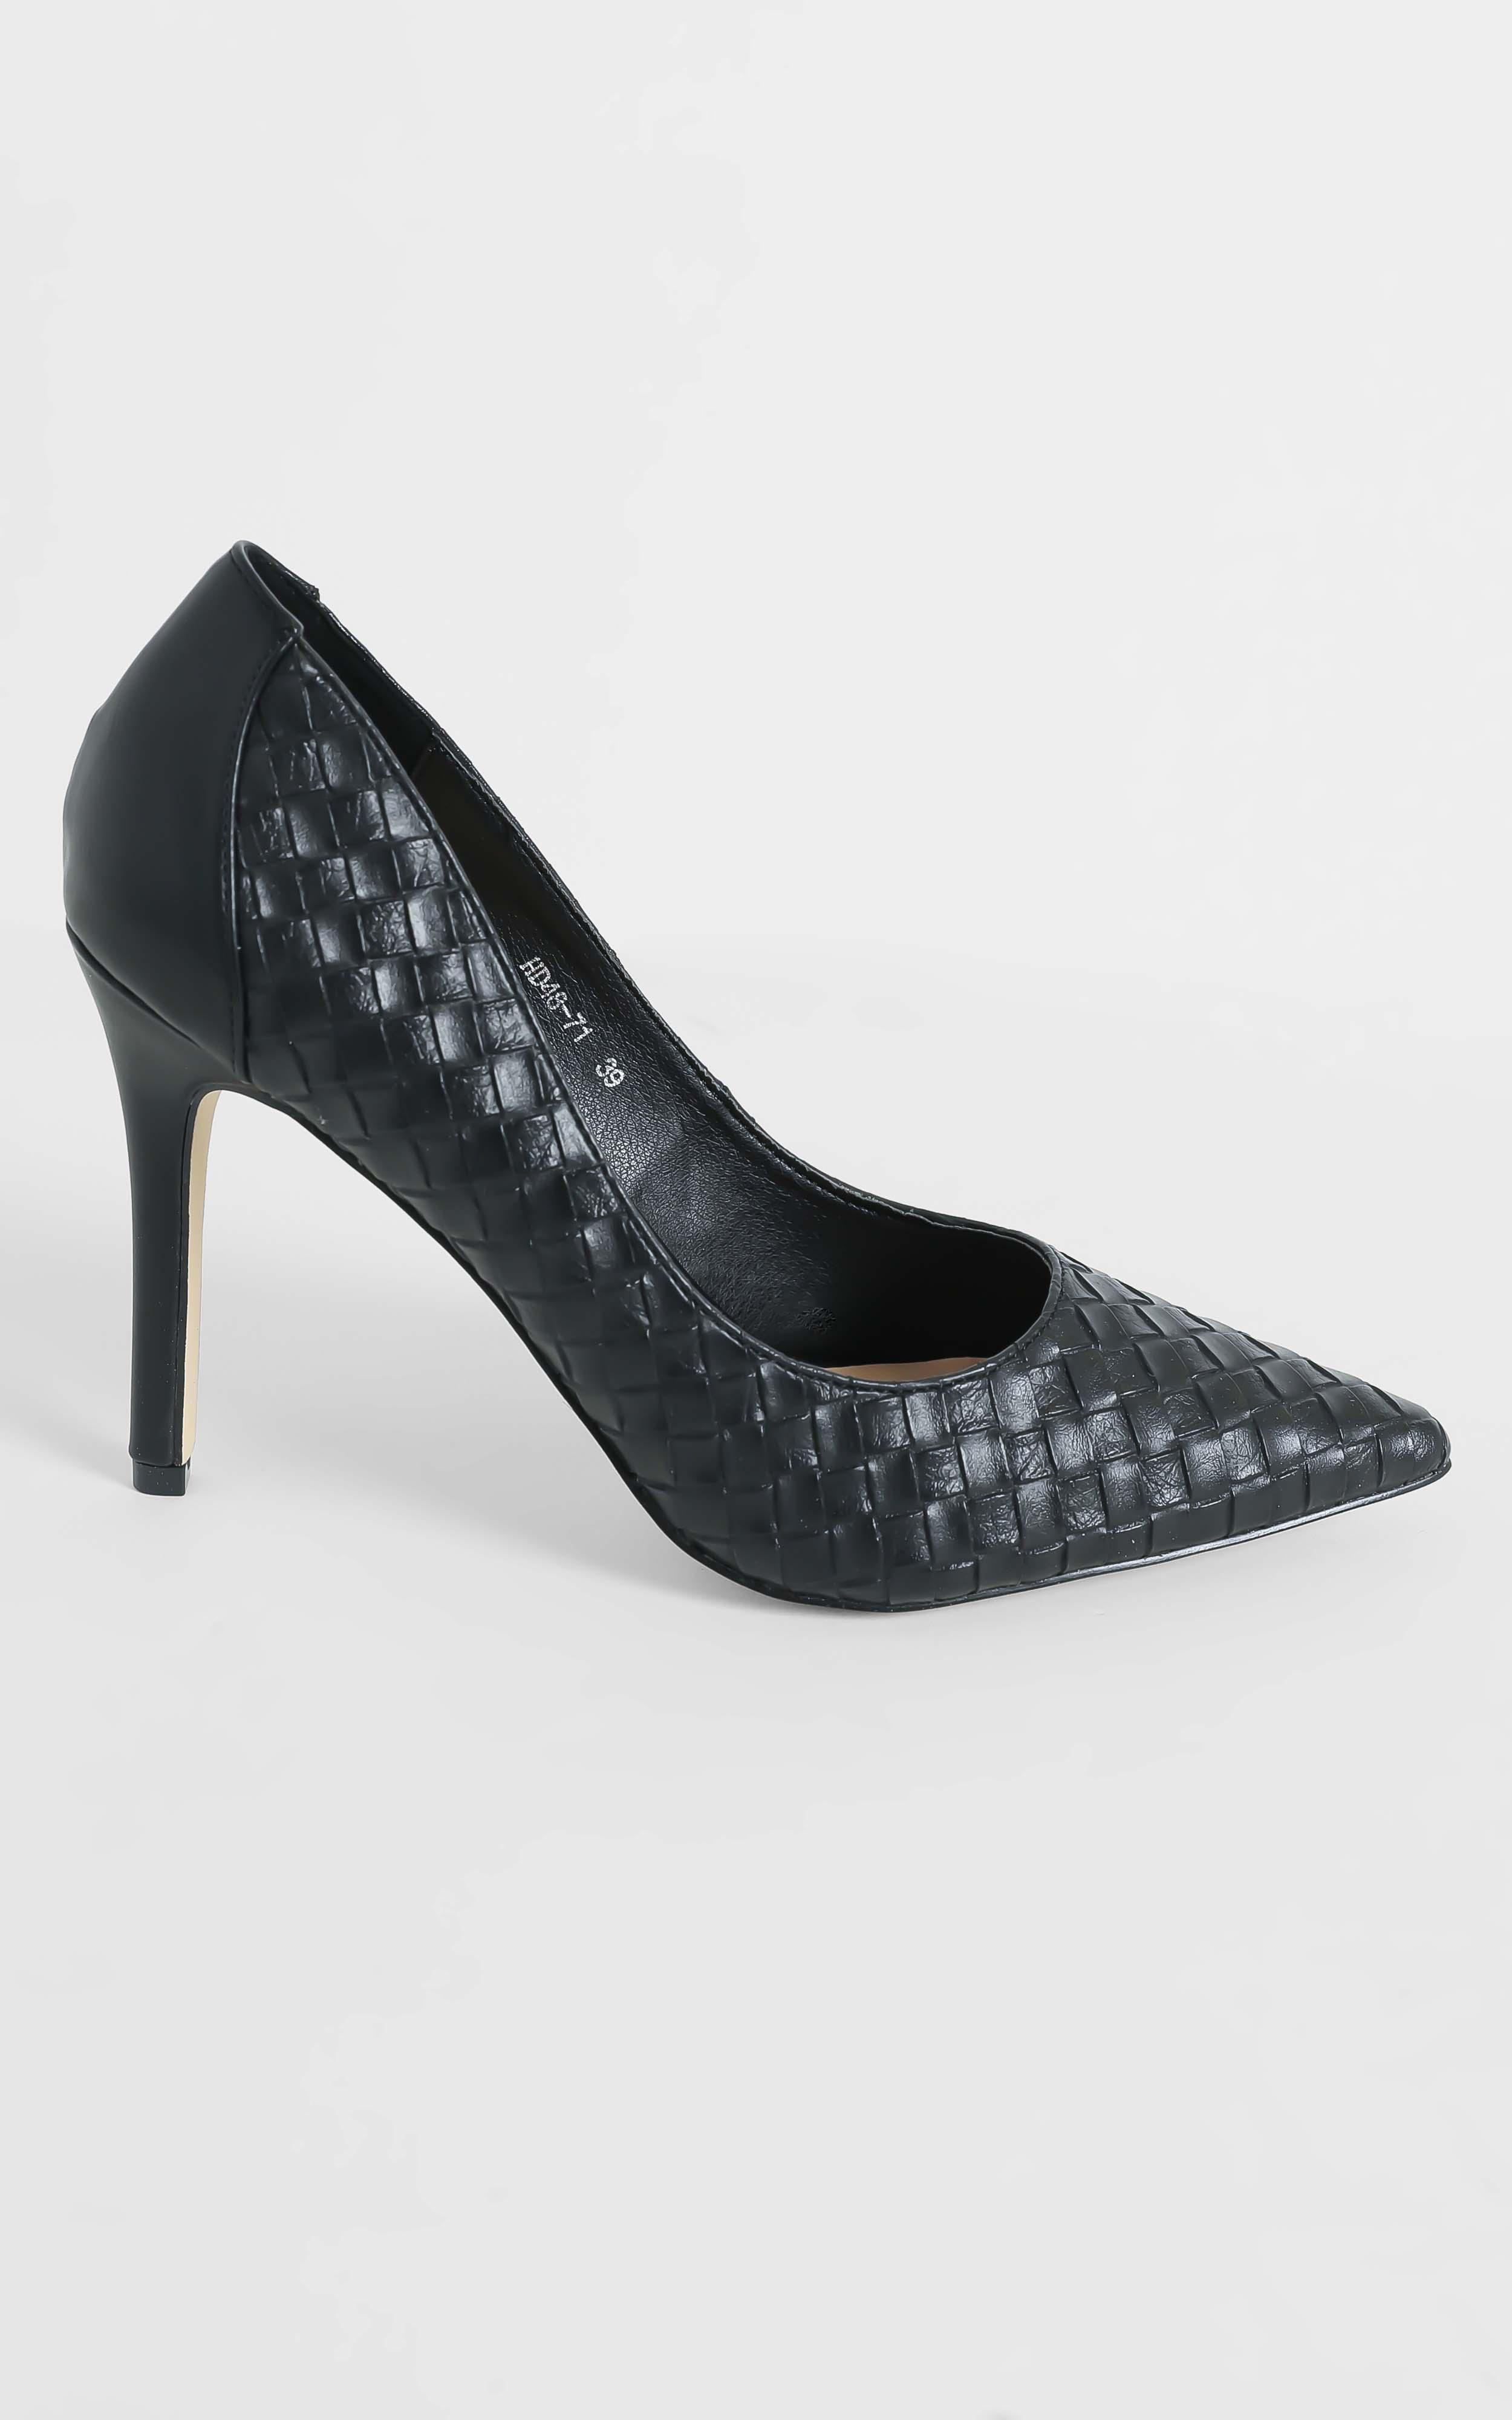 Verali - Huxley Heels in Black Smooth - 05, BLK1, hi-res image number null